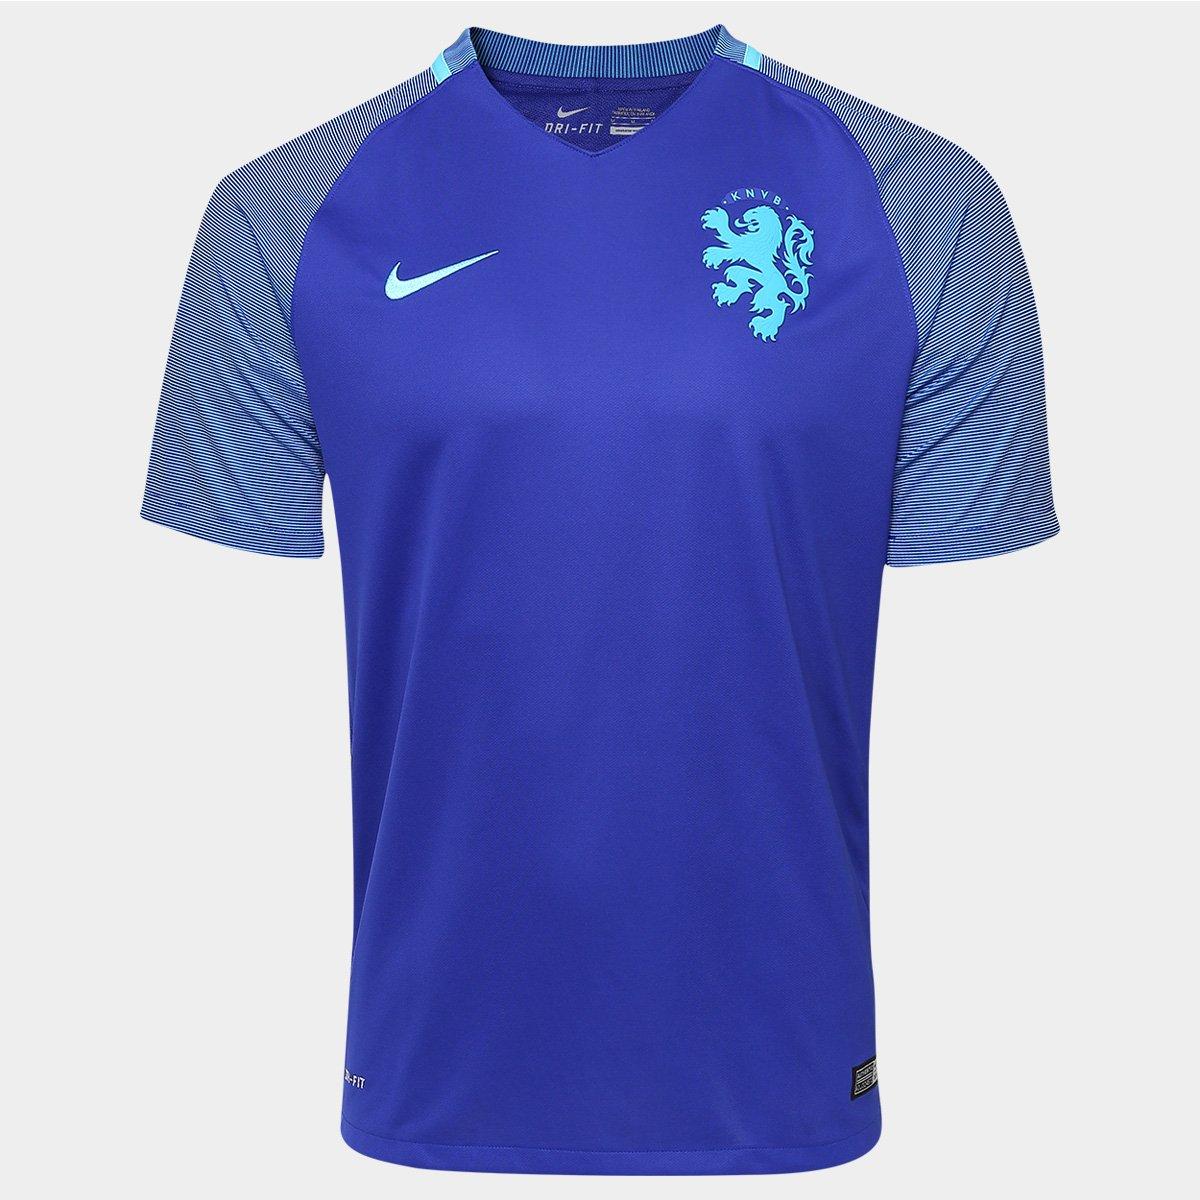 09f9f0562 Camisa Nike Holanda Away 2016 s/nº   Netshoes